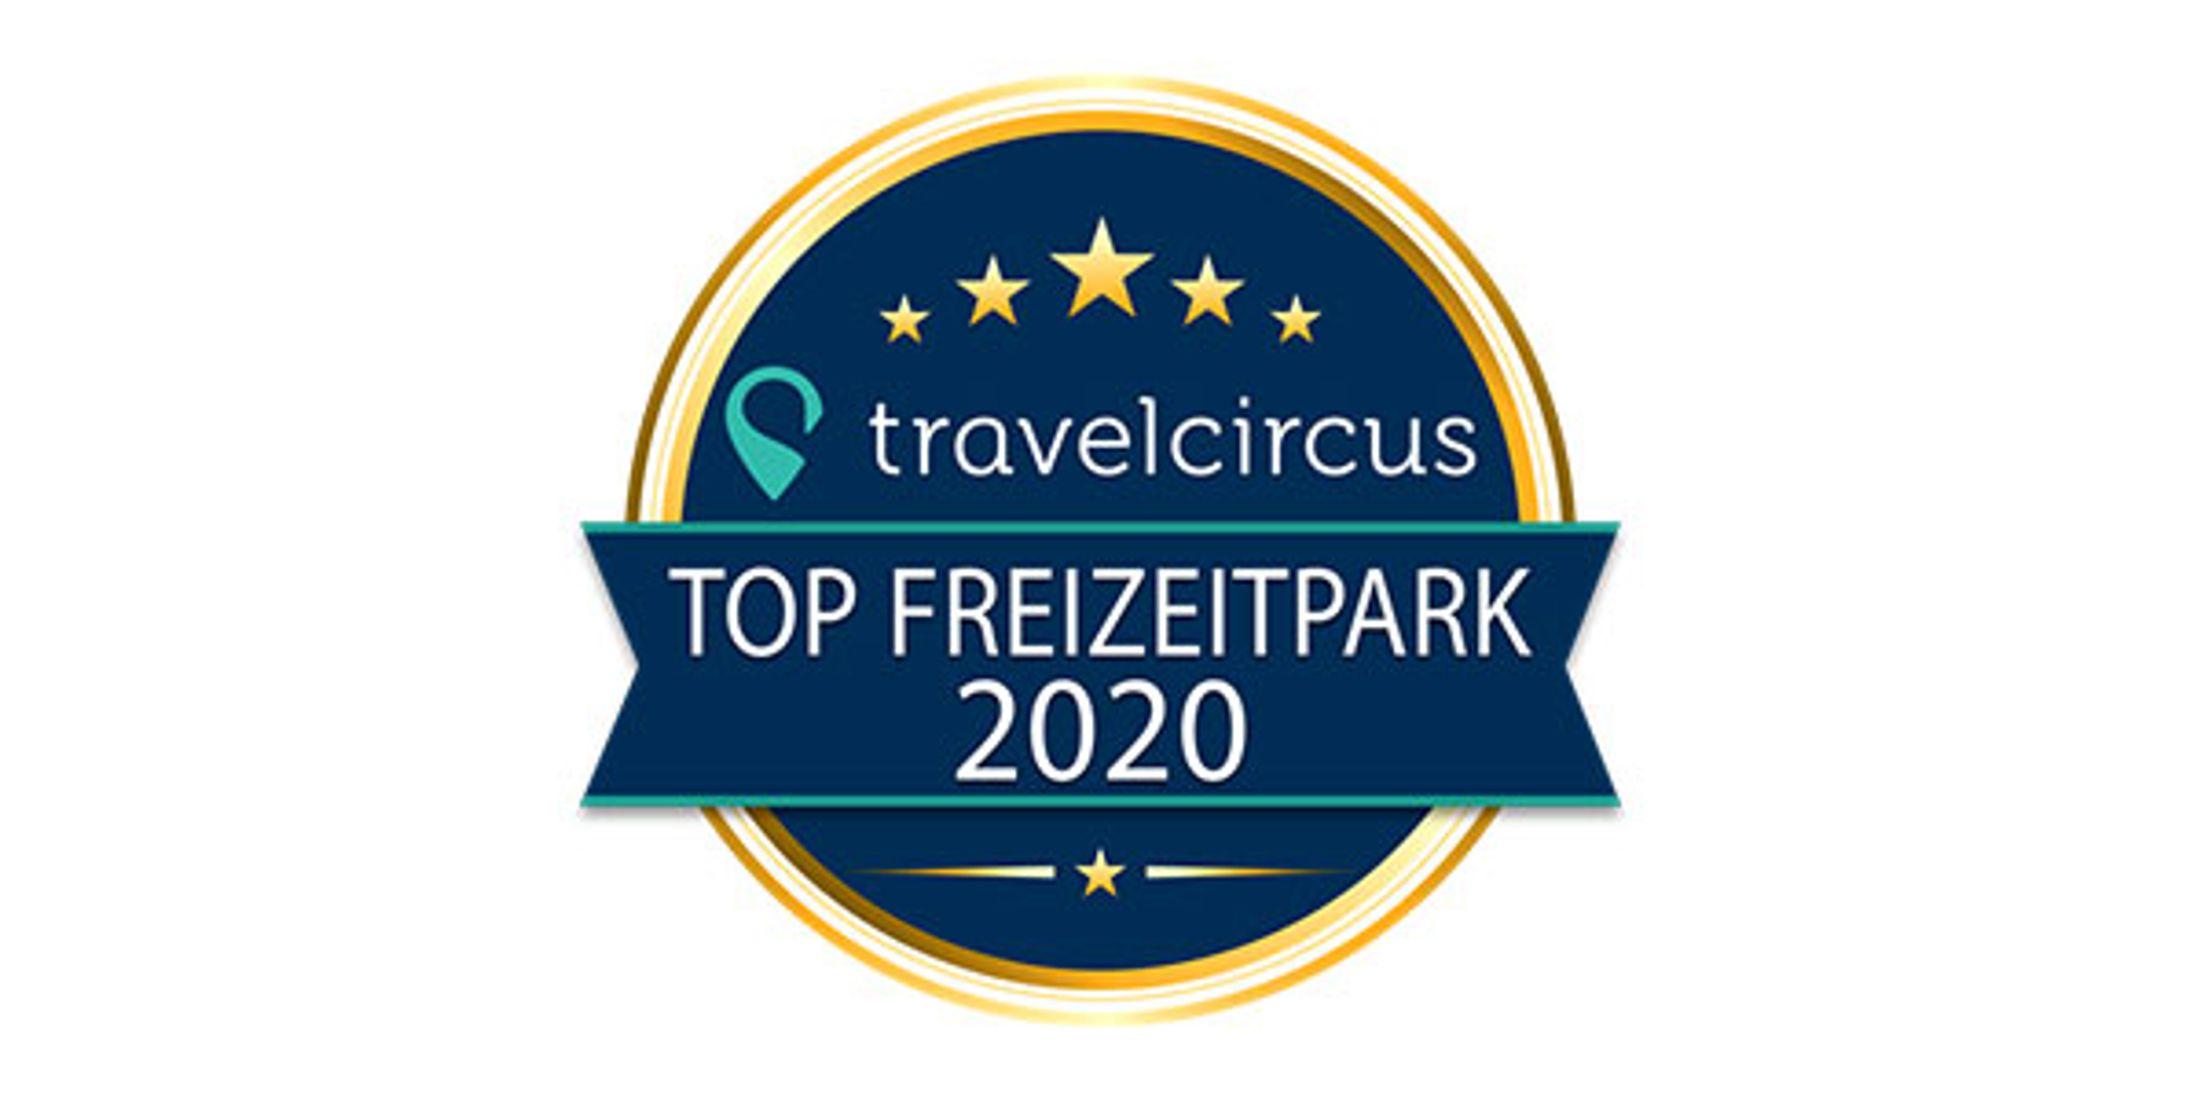 Travelcircus Freizeitpark 2020